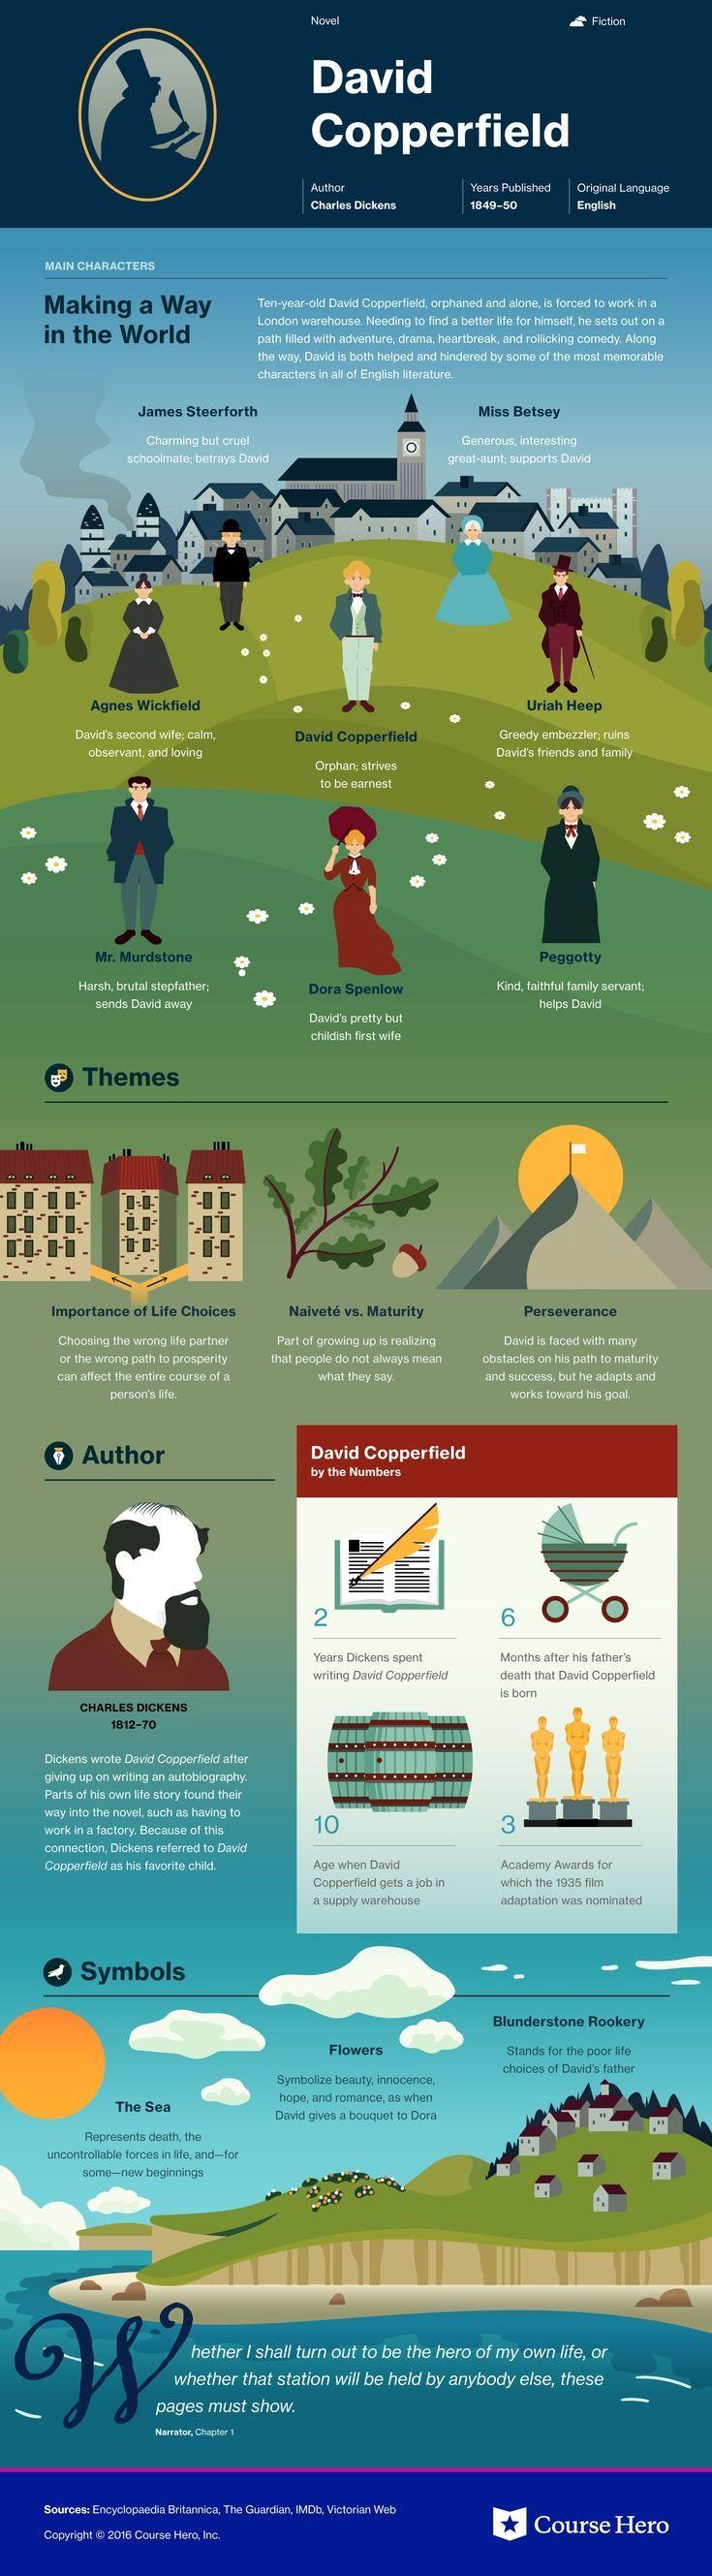 David Copperfield infographic | Course Hero